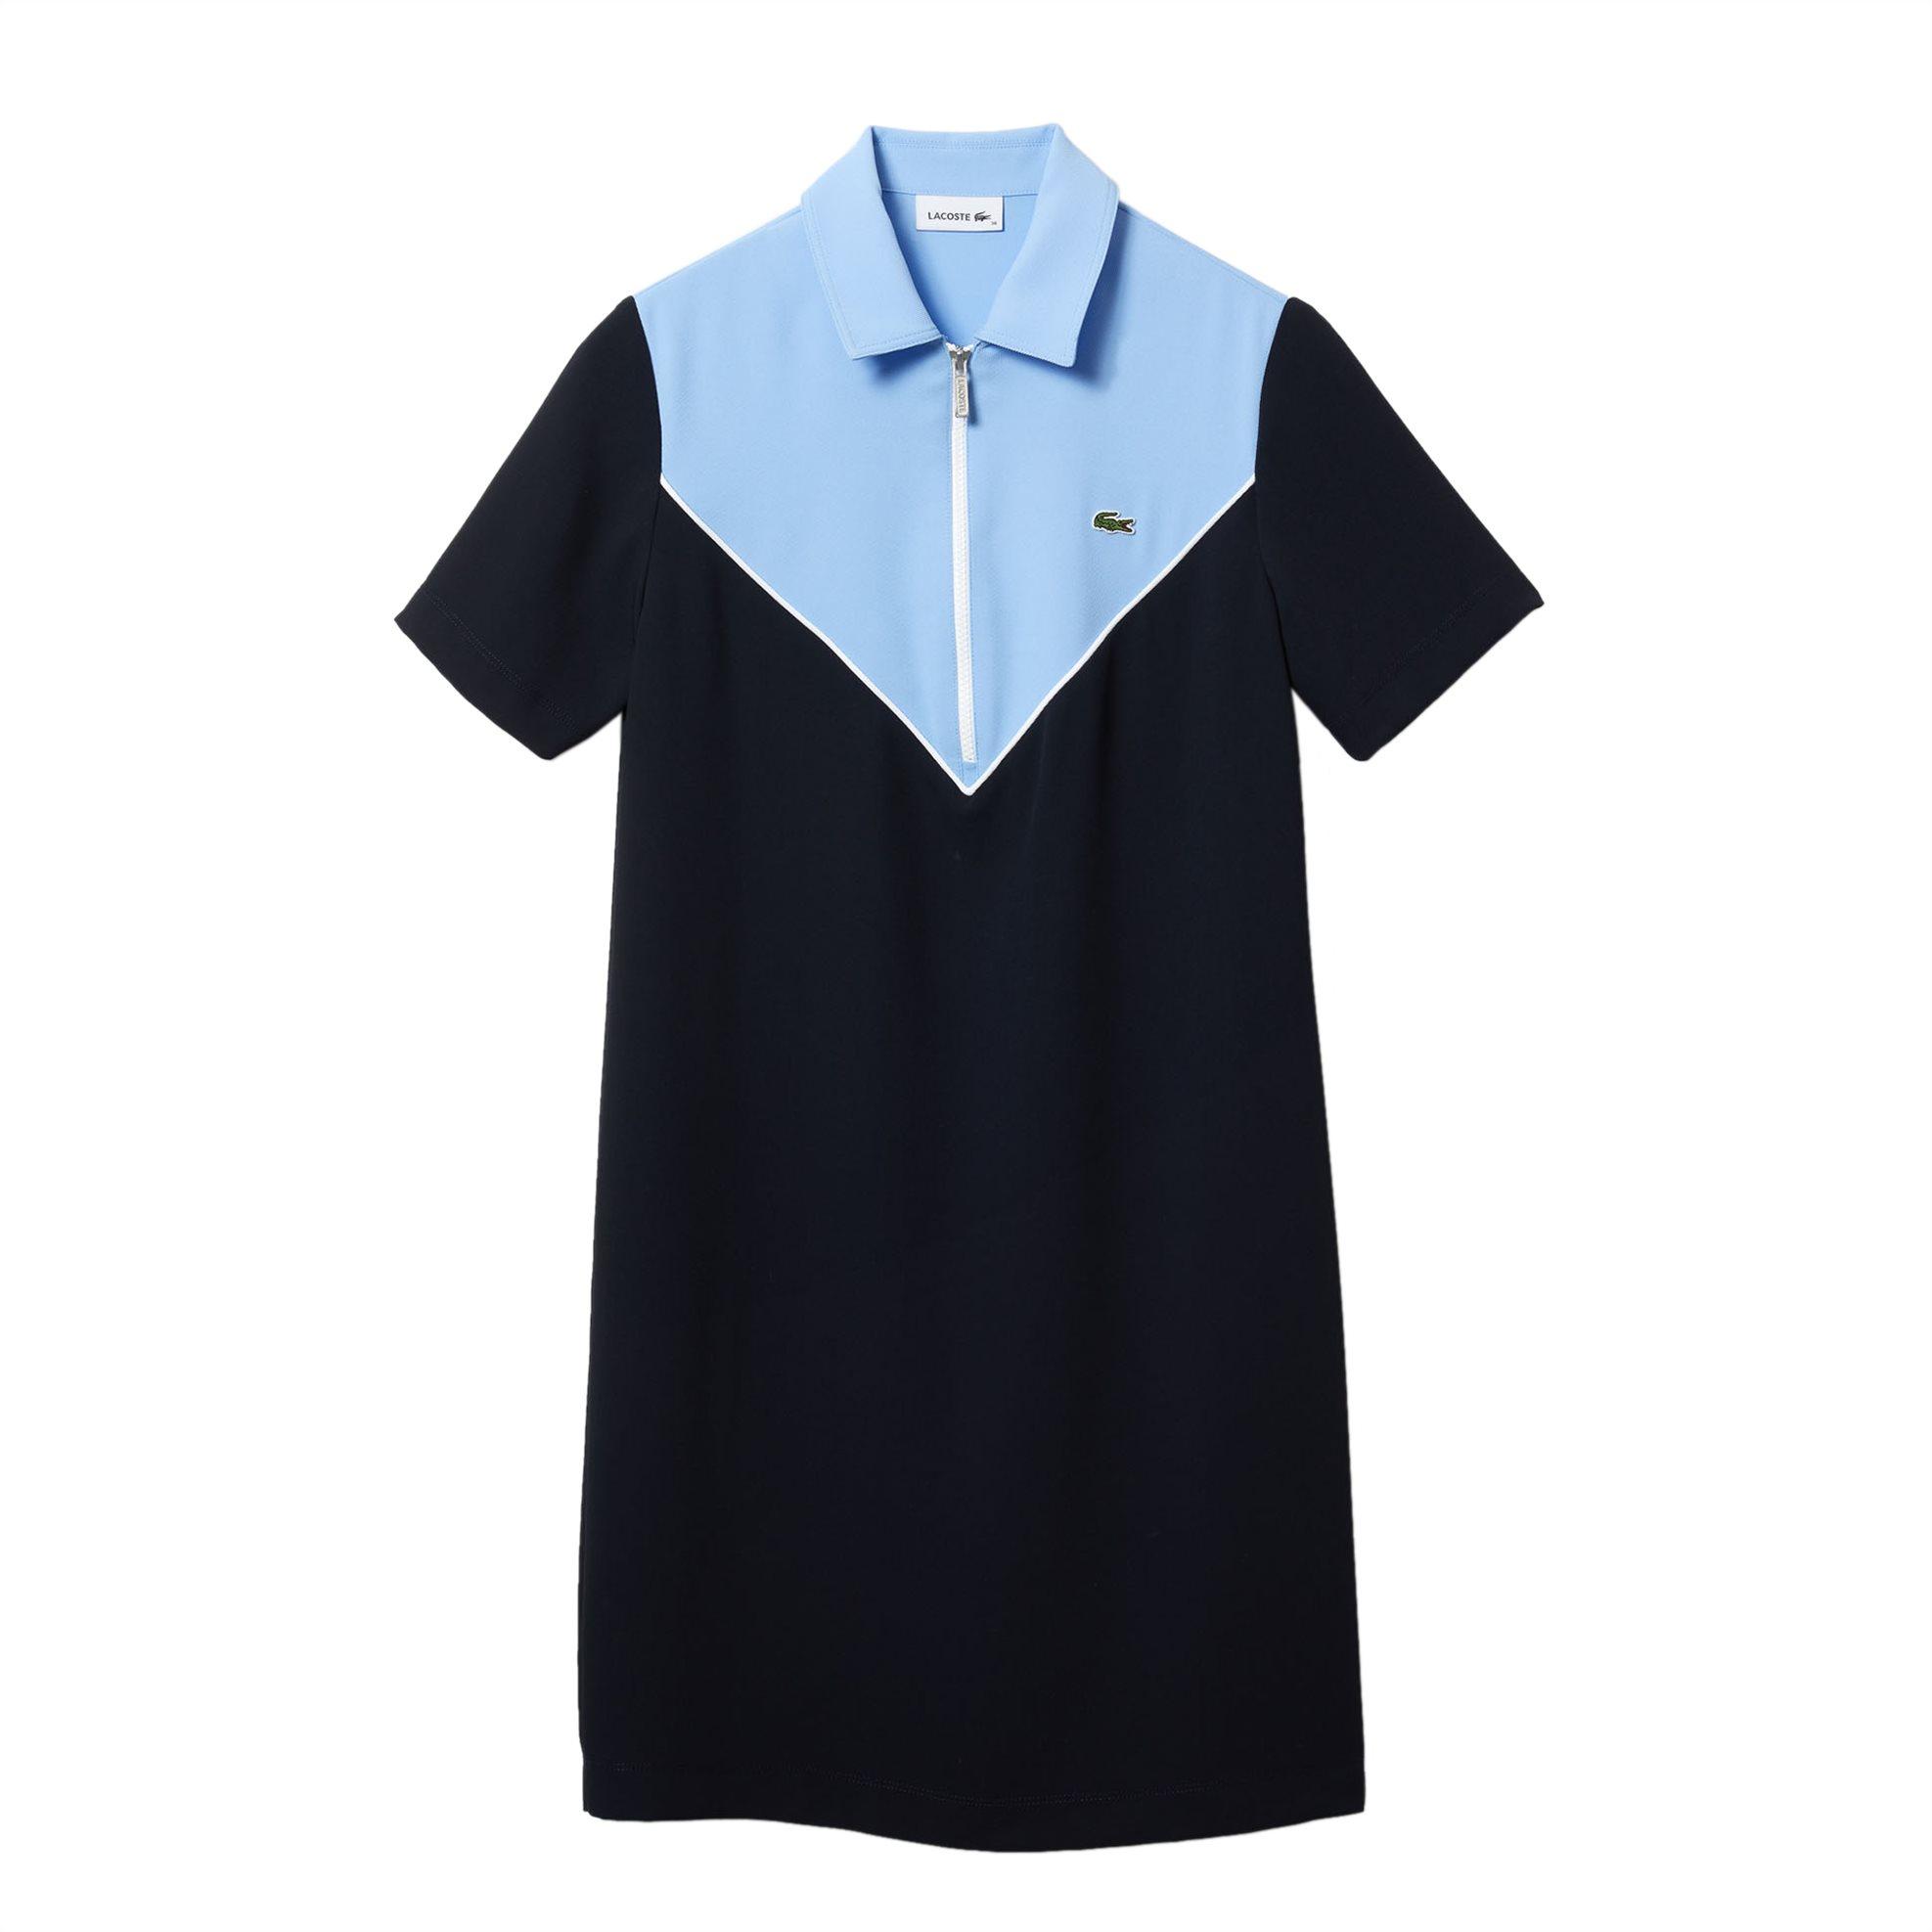 Lacoste γυναικείο mini φόρεμα colourblocked - EF0225 - Μαύρο